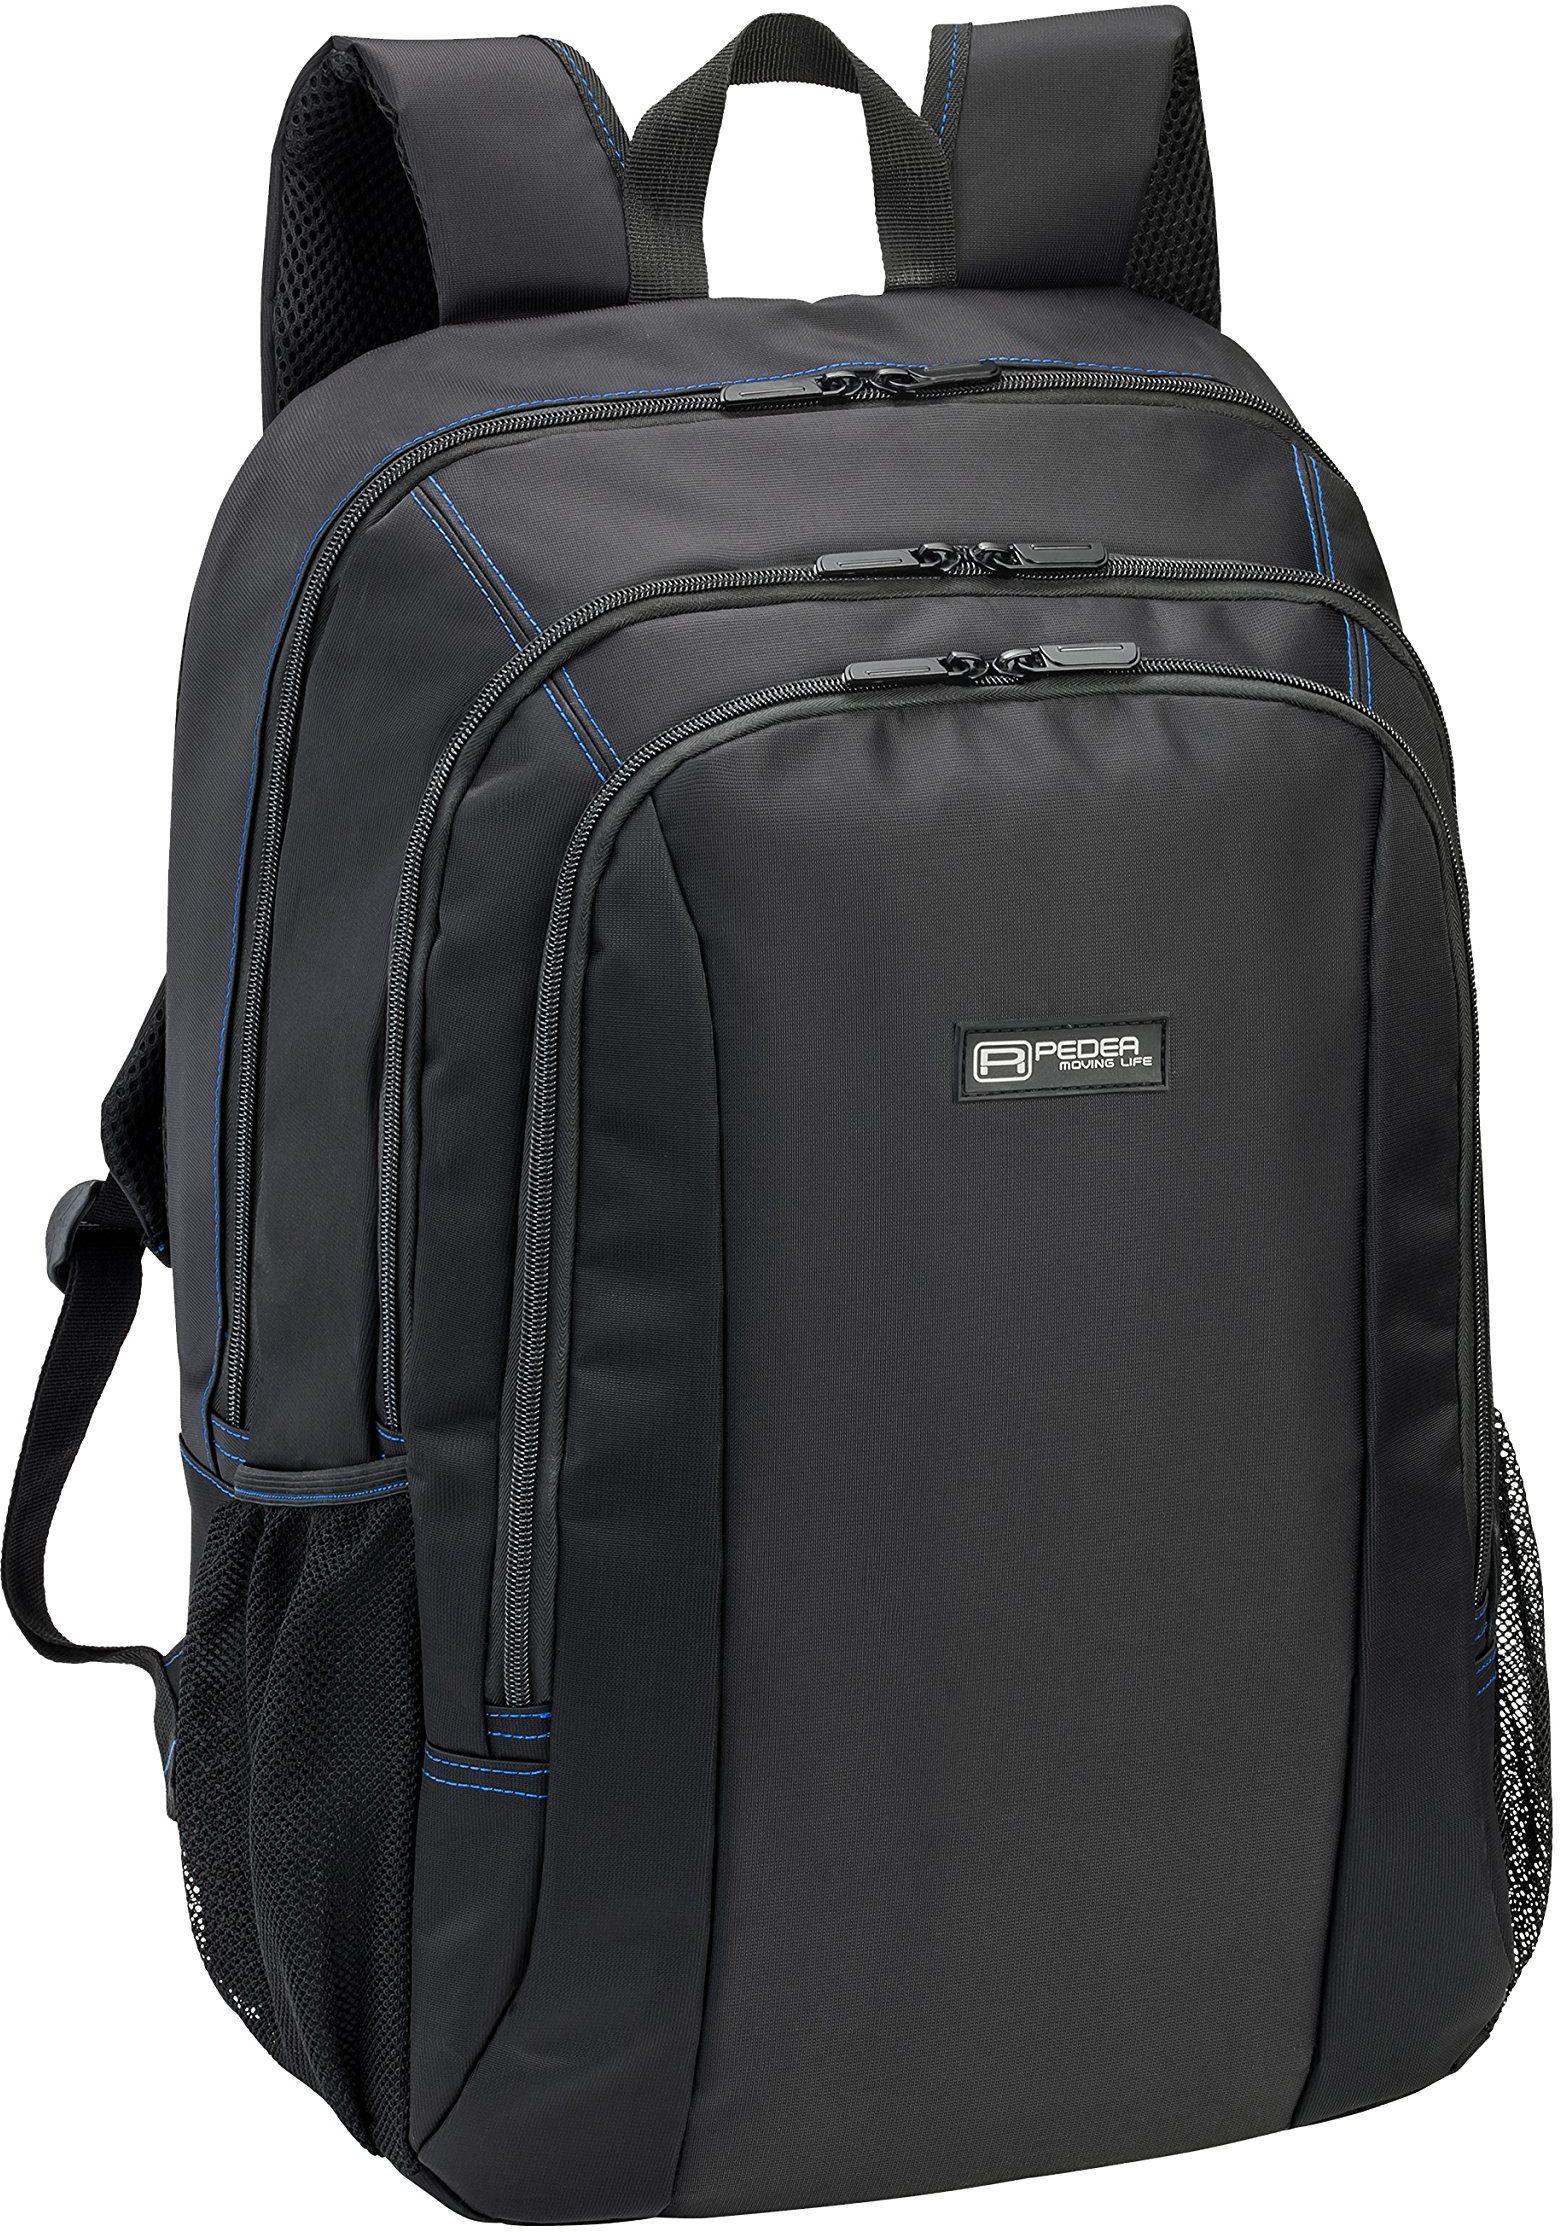 "PEDEA Plecak dla graczy ""First One"" laptop notebook plecak do 17,3 cala (43,9 cm) pasuje do Asus, Dell, MSI - wodoodporny, czarny/niebieski"